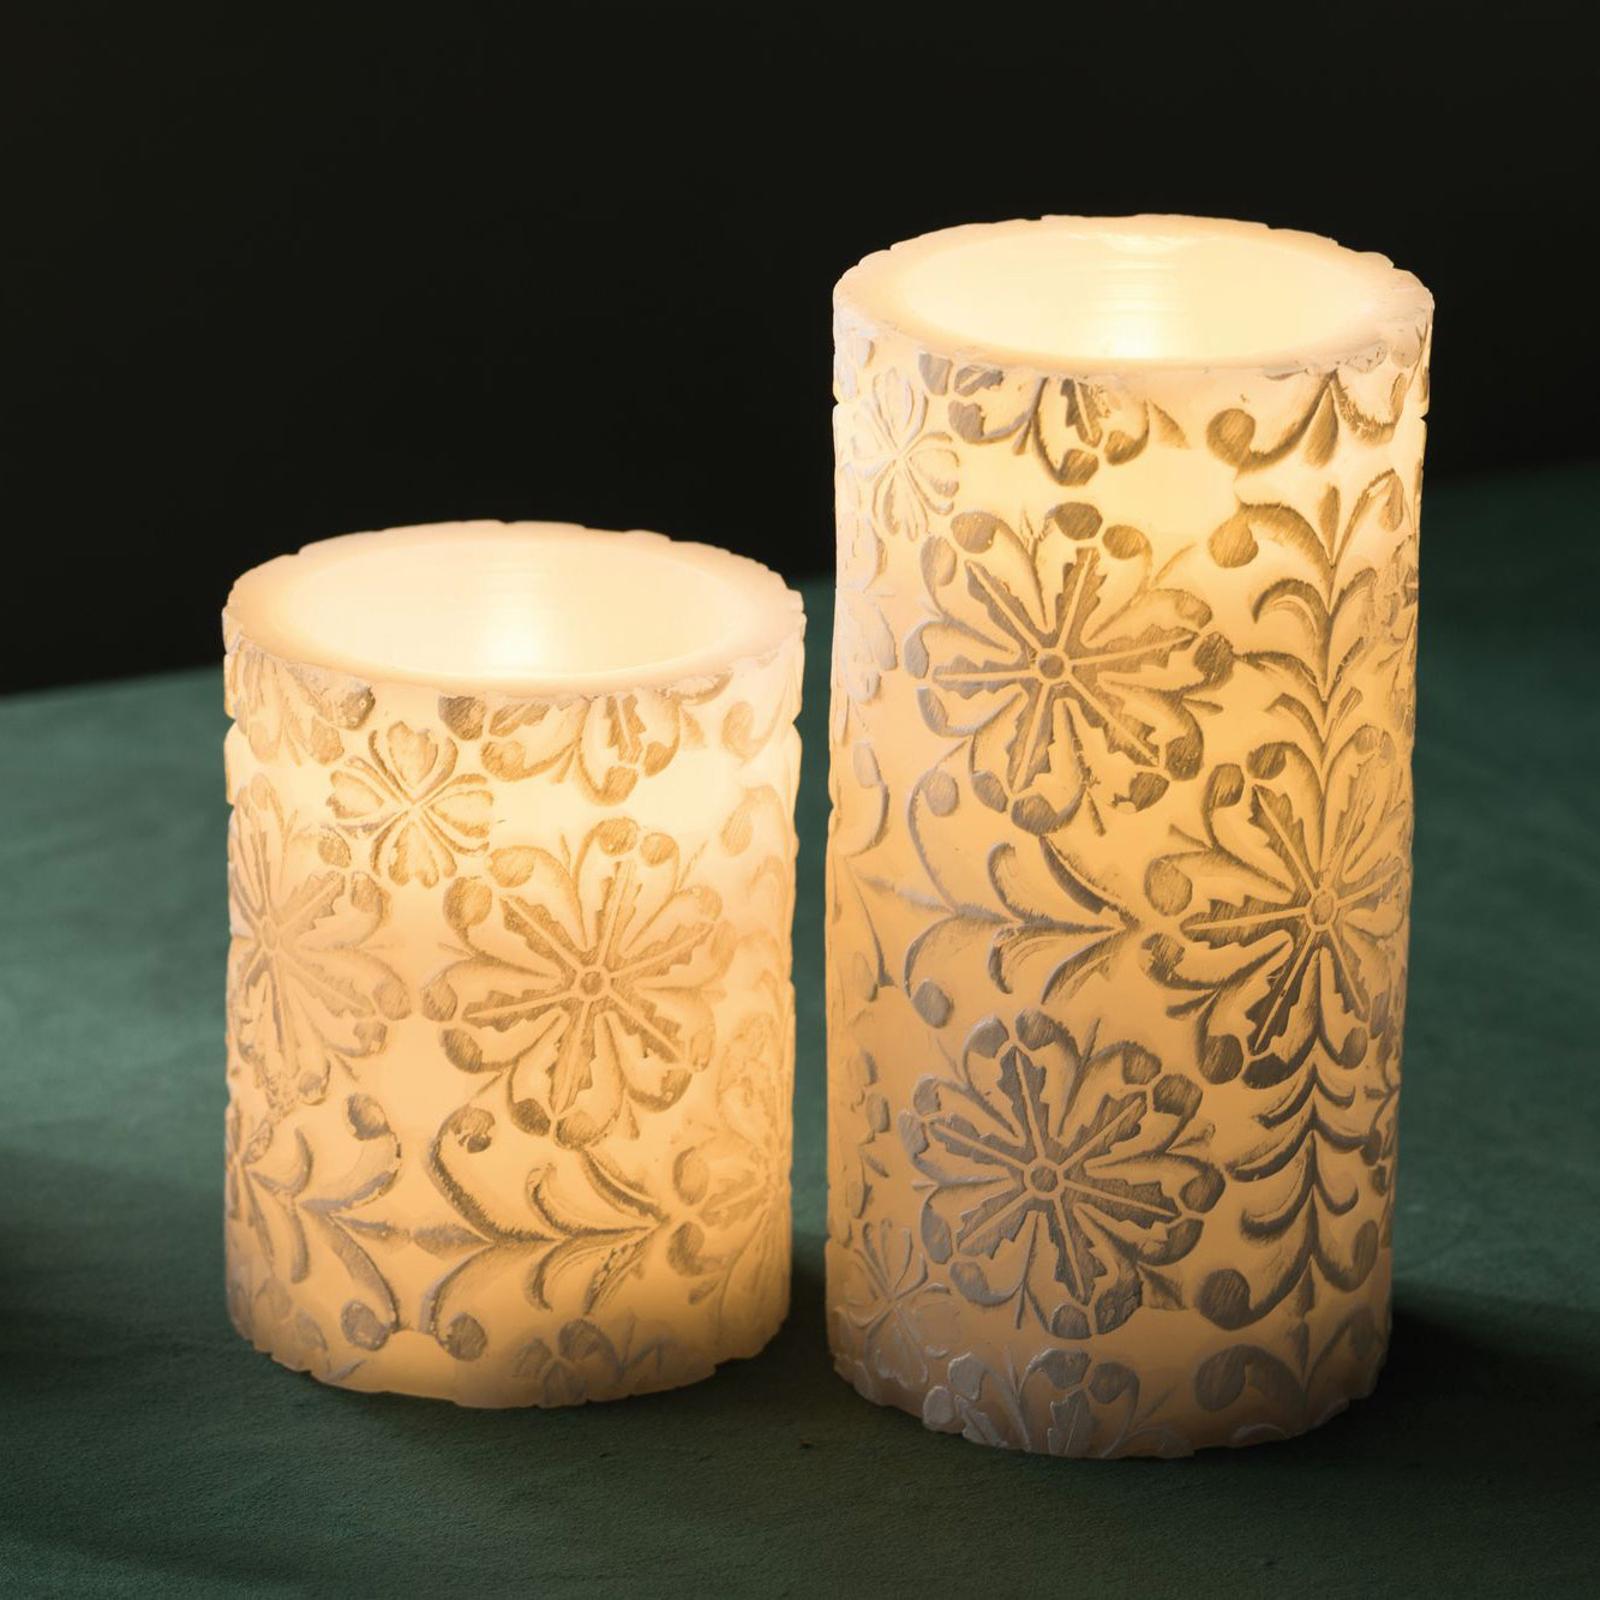 Pauleen Little Lilac Candle LED-mignon 2er-sett